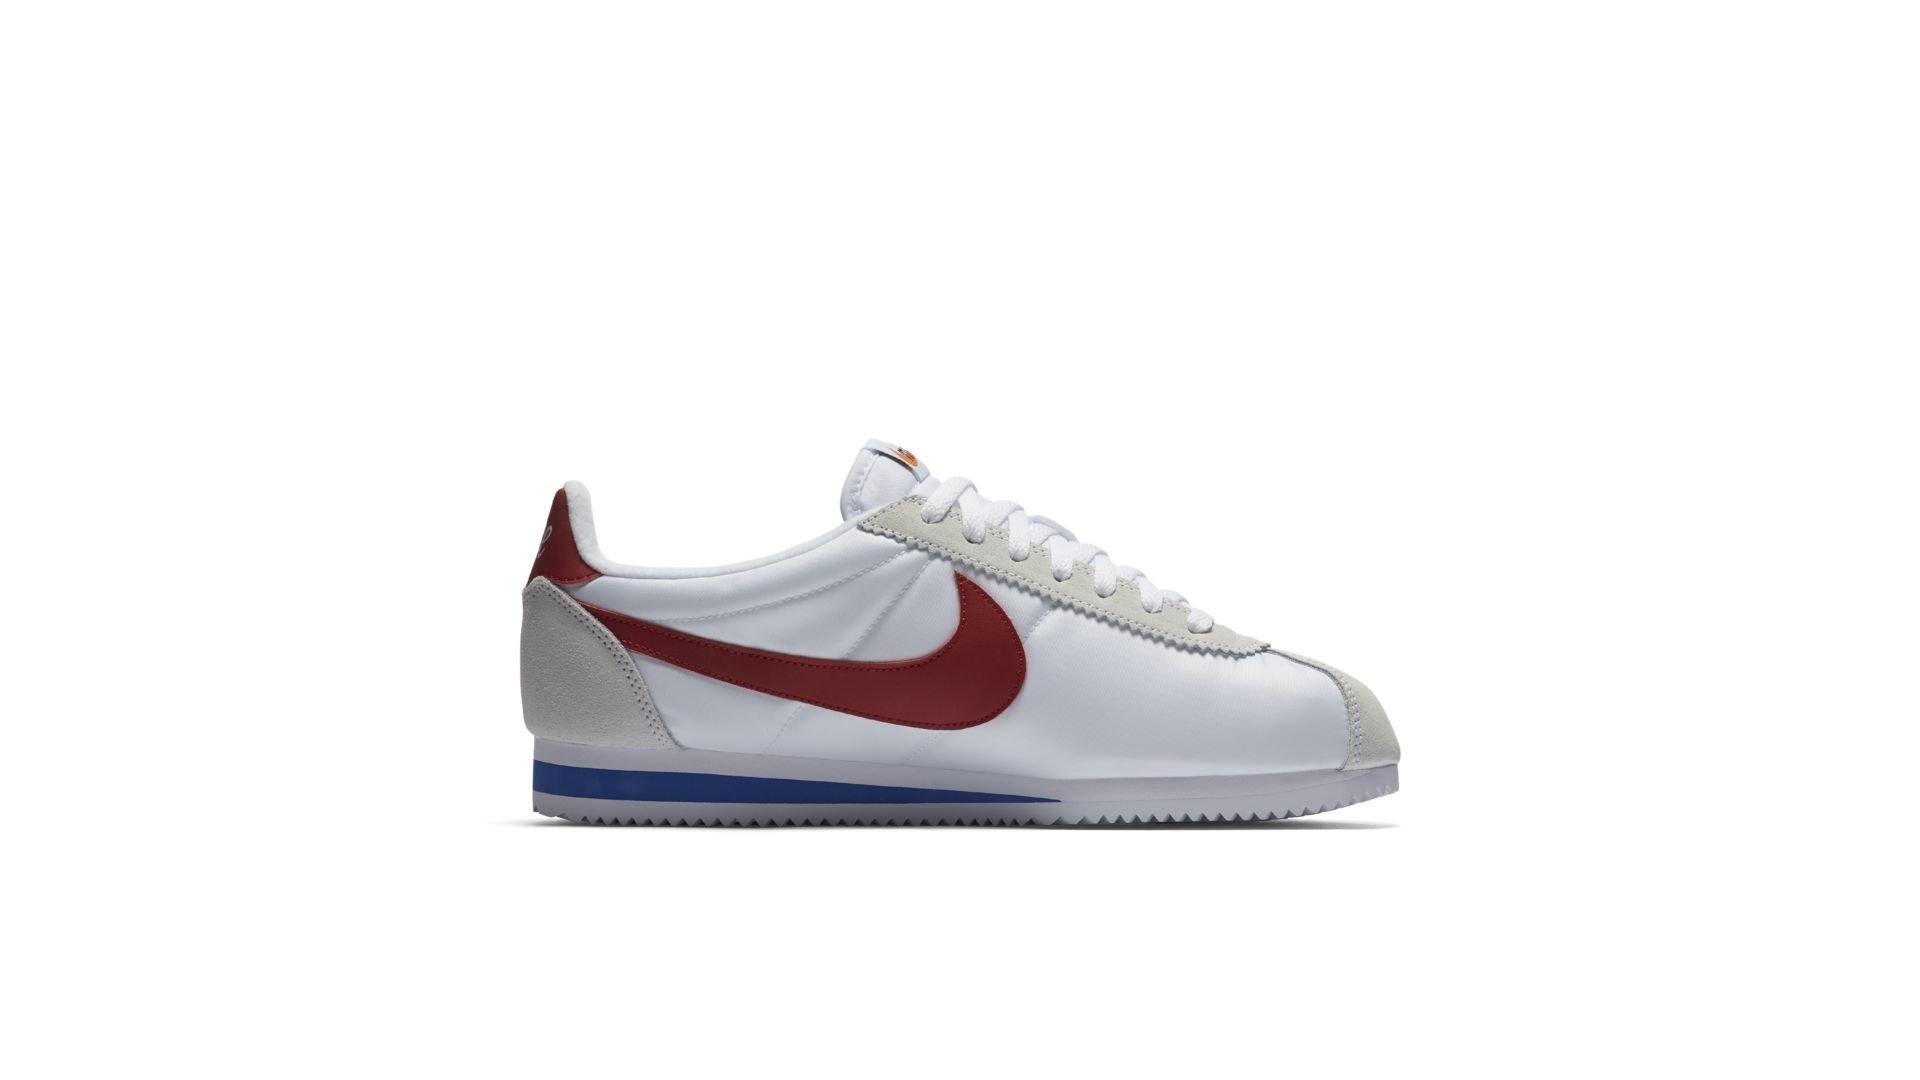 Nike Classic Cortez Premium Nylon Forrest Gump (876873-101)